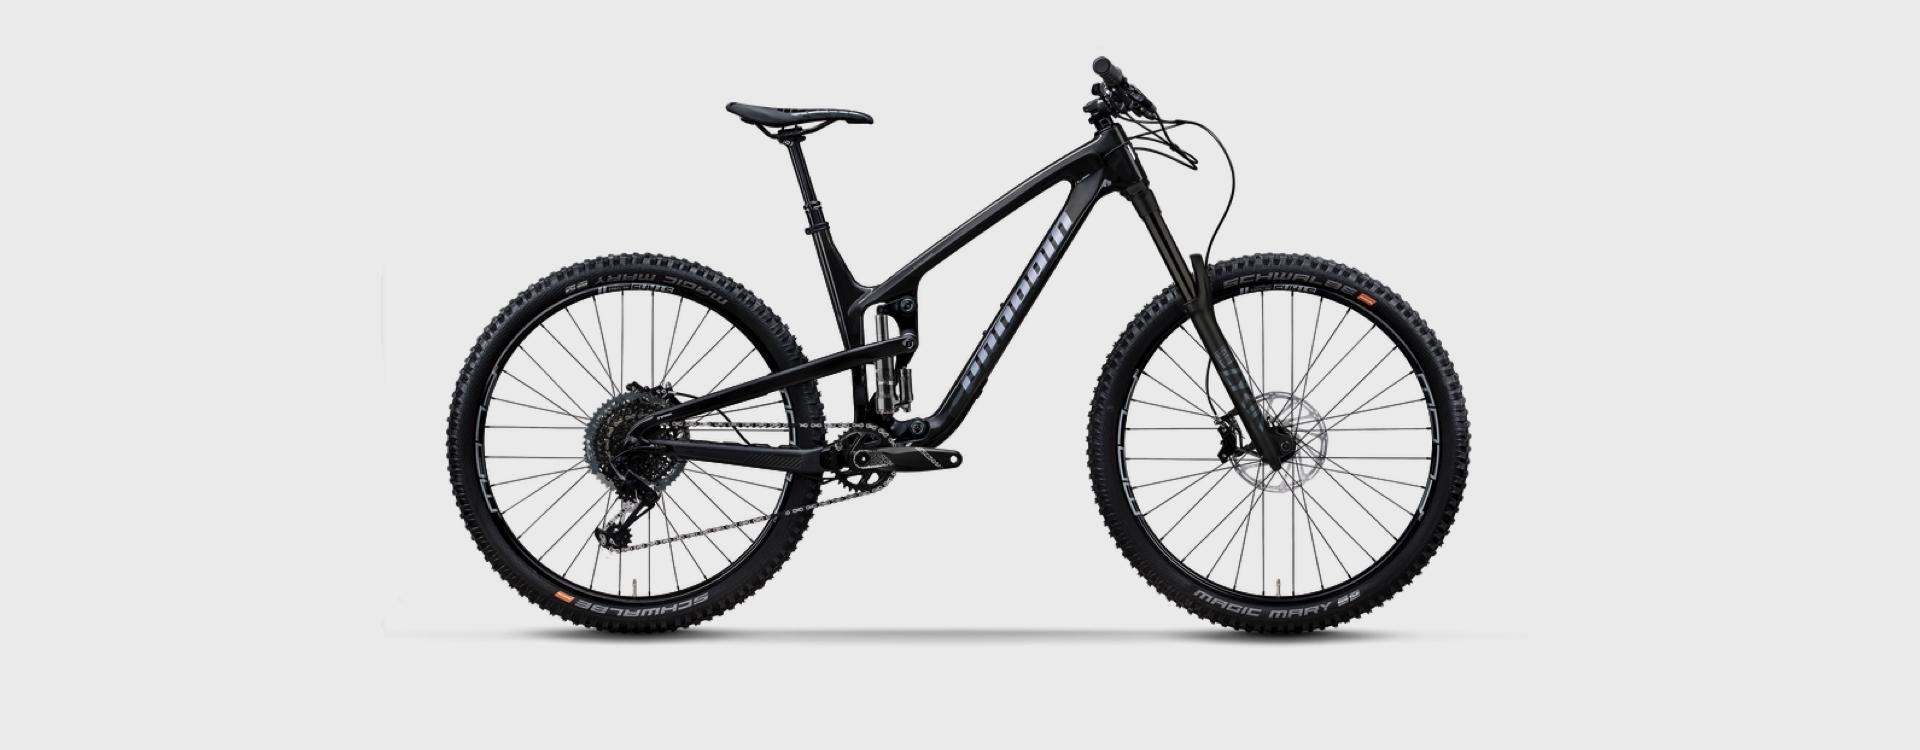 Bike Verleih Gummersbach Propain Bikes Testcenter NRW Tyee 6 - CF - XL - 29 - Raw - 1920x750